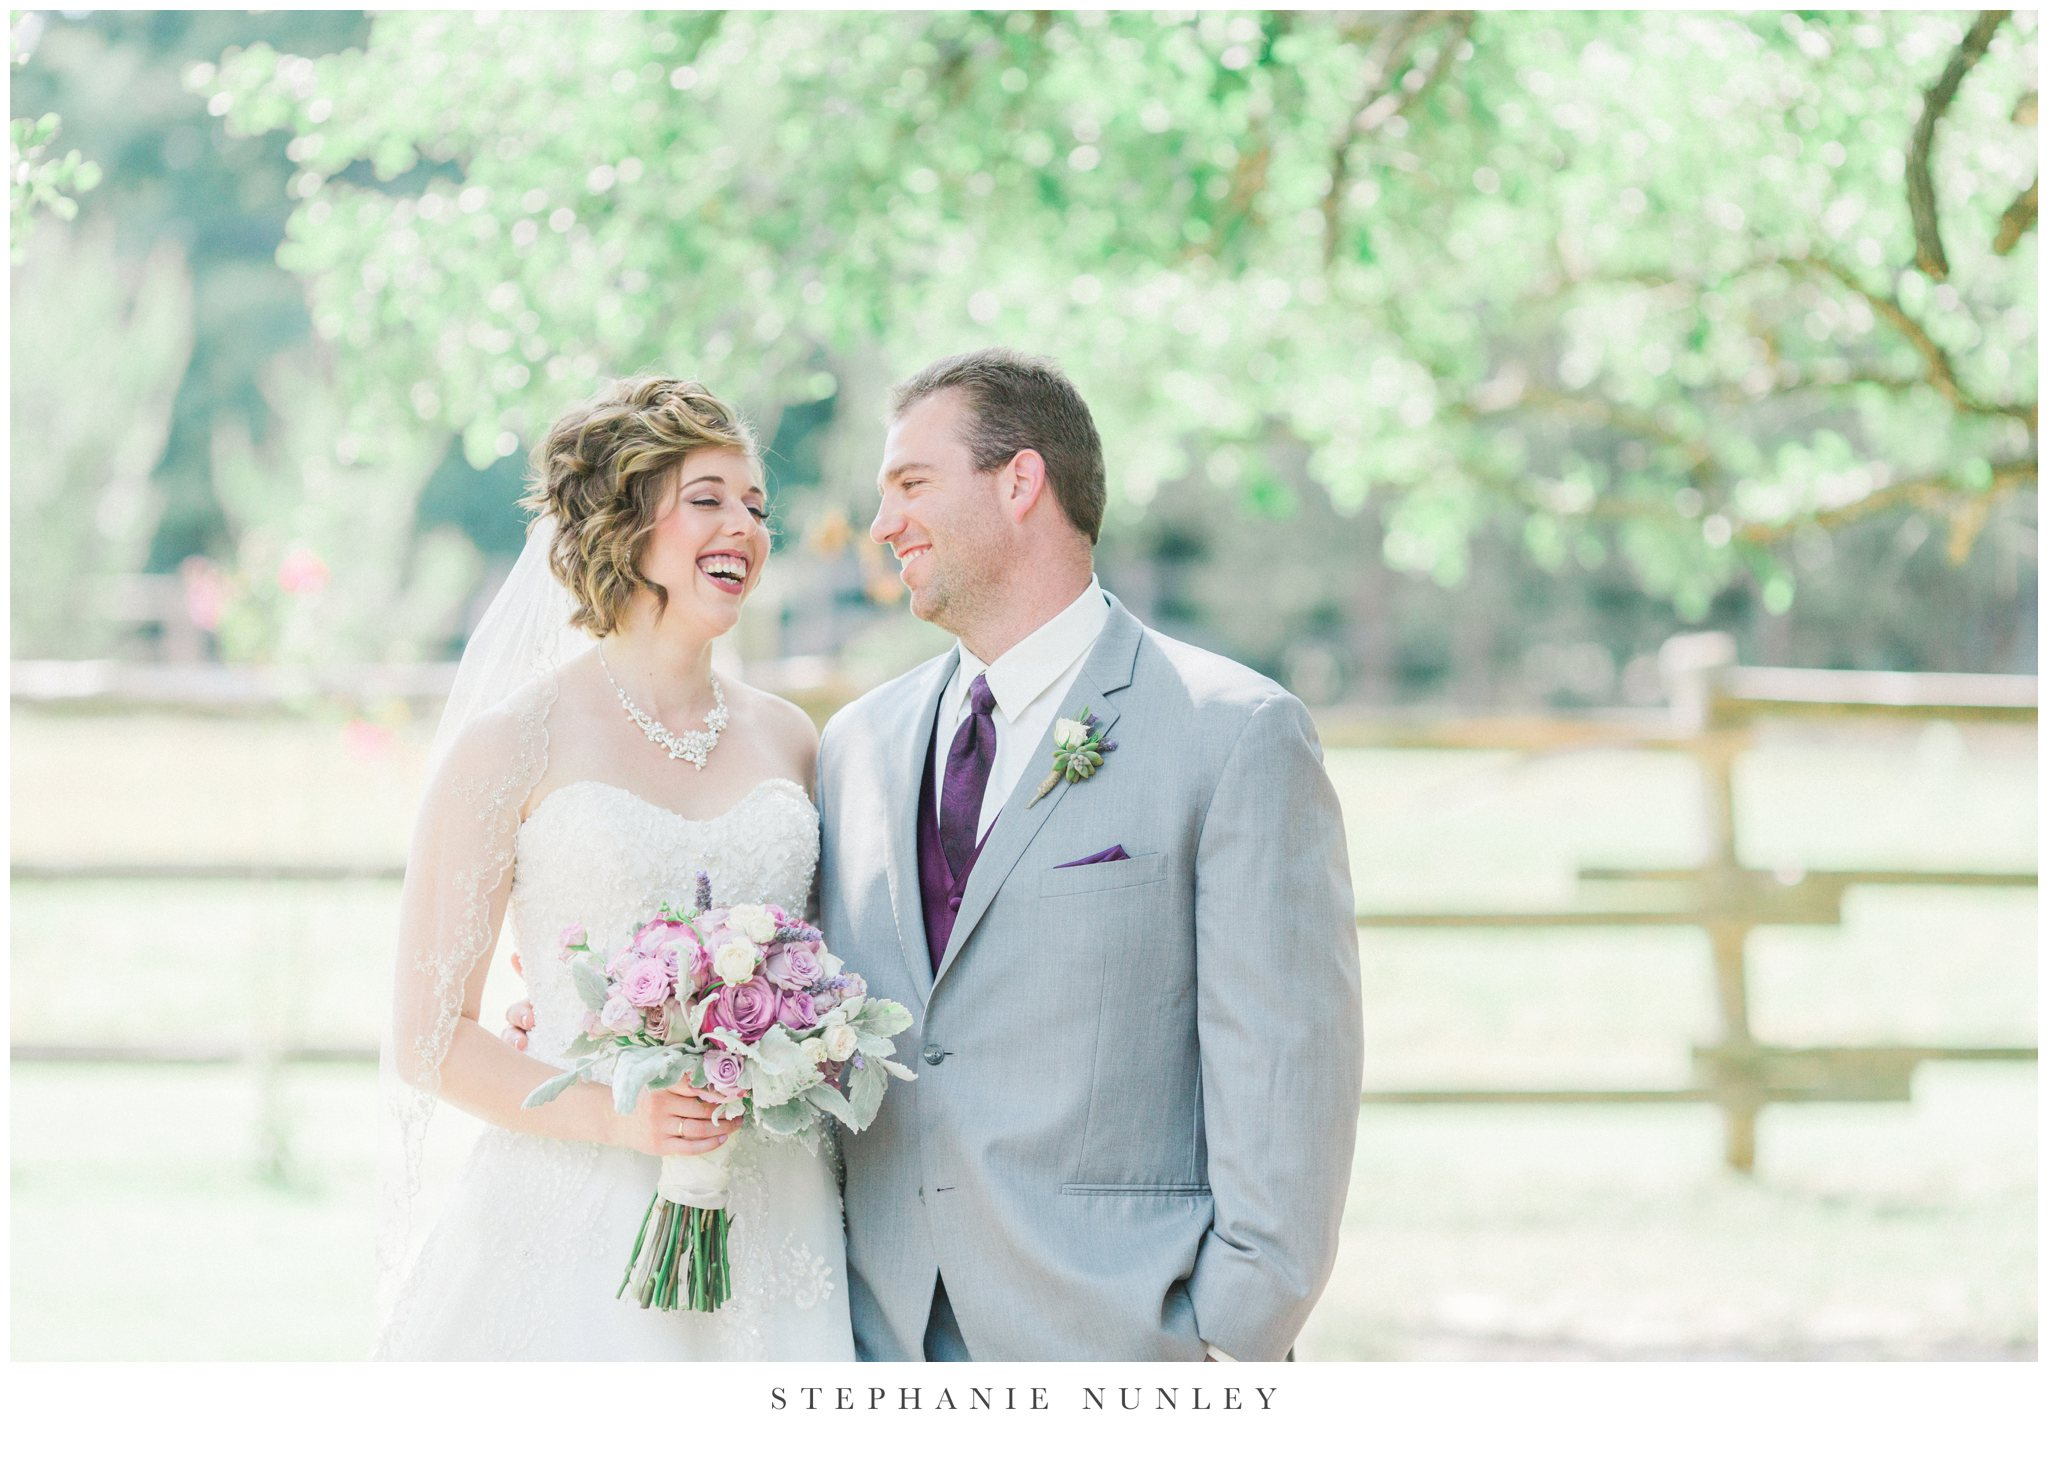 southern-classy-outdoor-barn-wedding-photos-0035.jpg